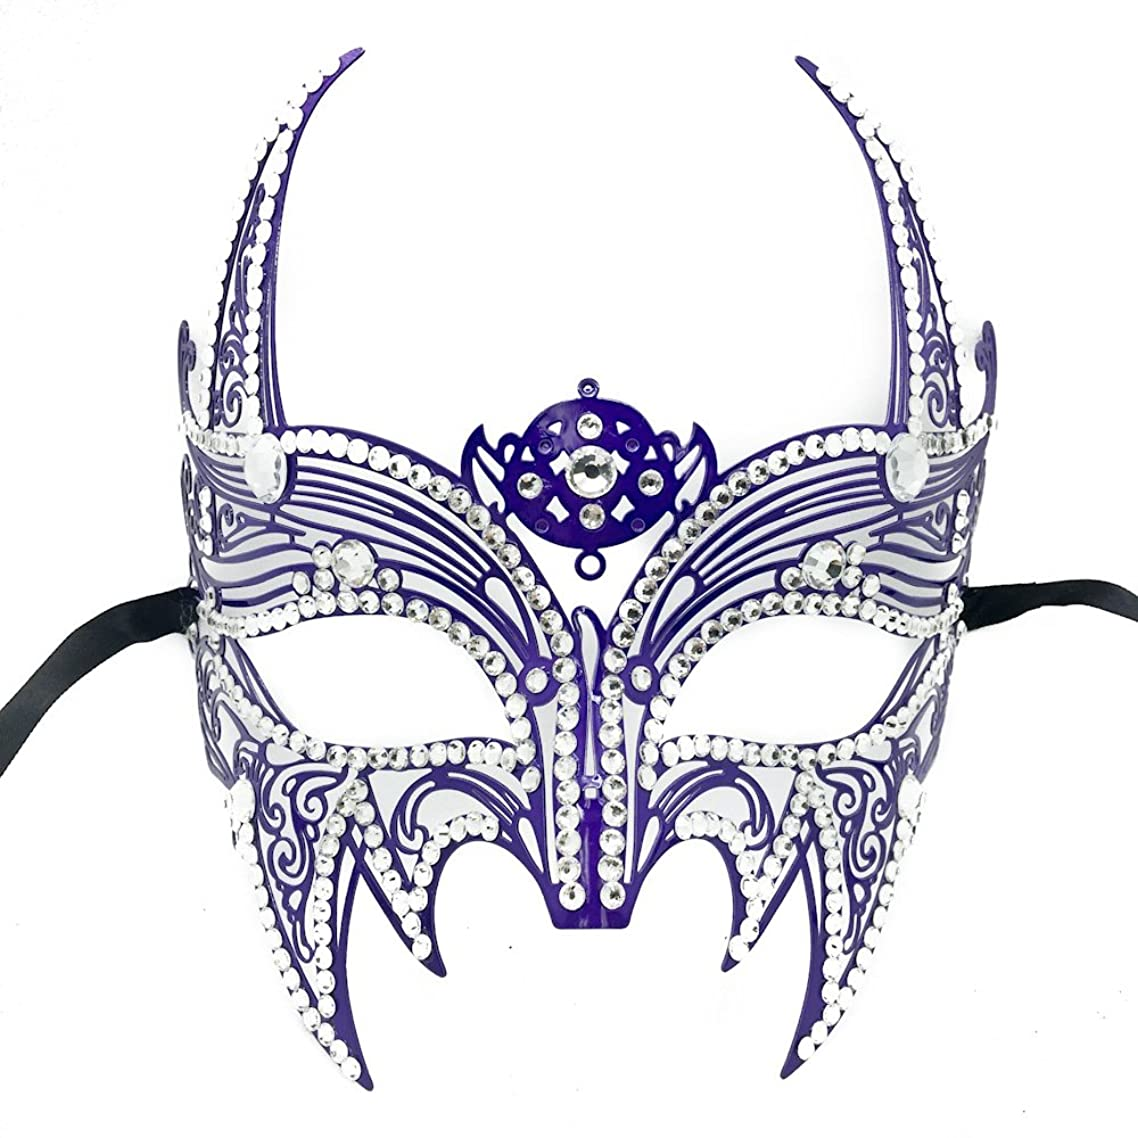 New Wolverine Men's Mask Laser Cut Venetian Halloween Unisex Masquerade Mask Costume Extravagant Inspire Design - Purple